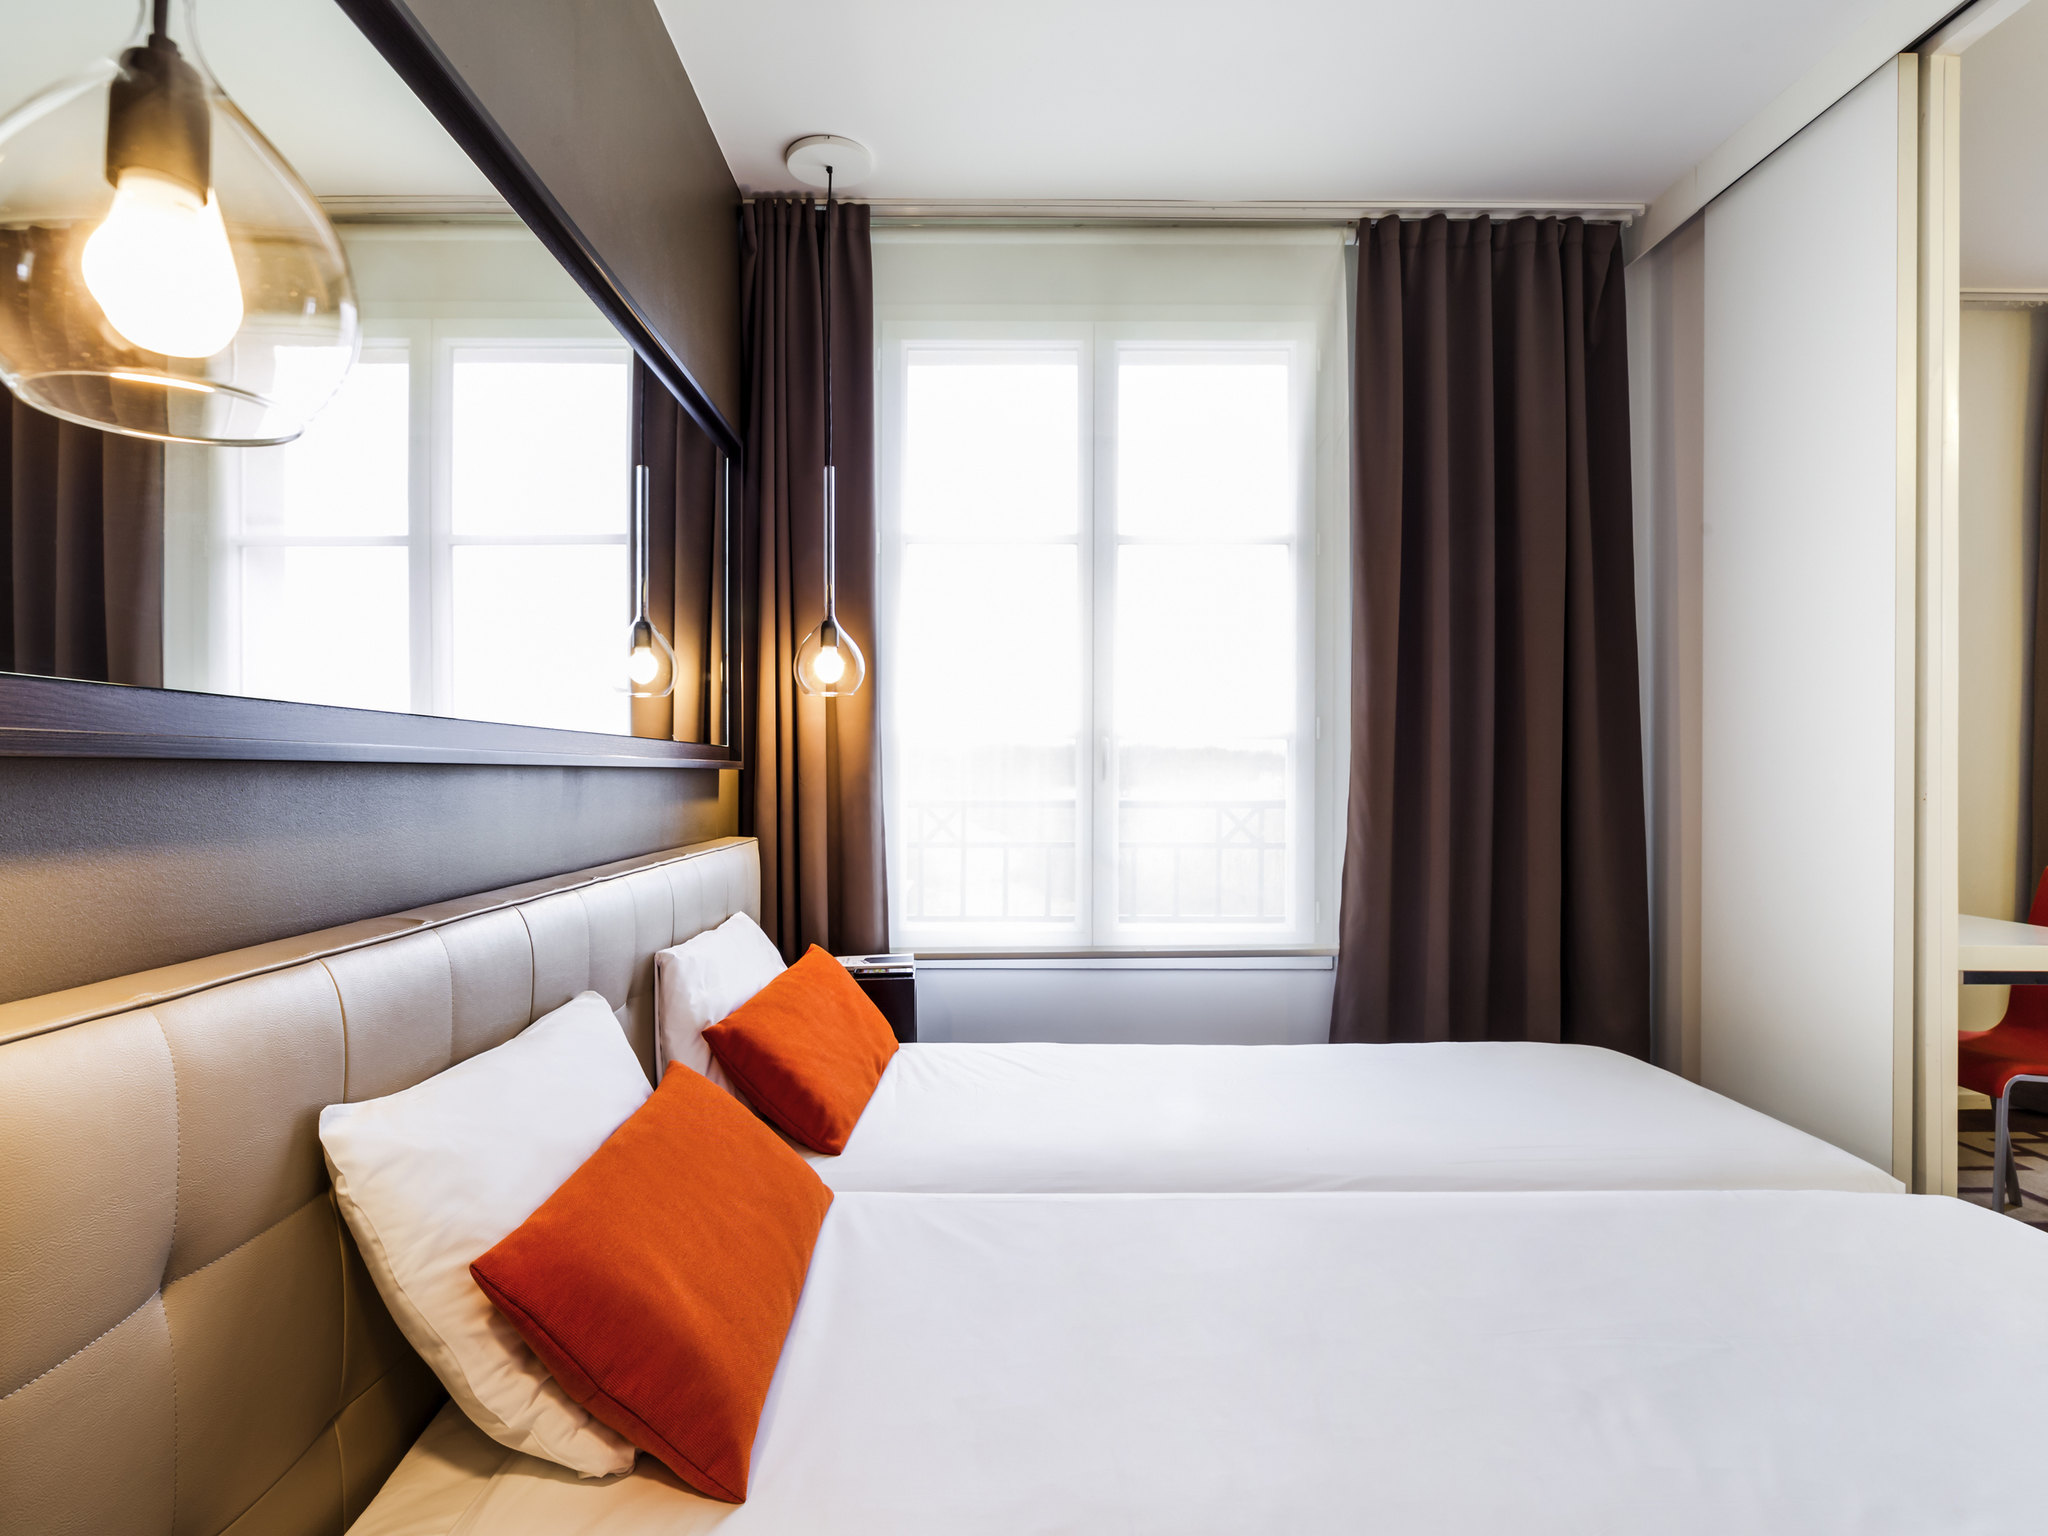 Hotel - Hipark by Adagio Marseille (opening February 2018)